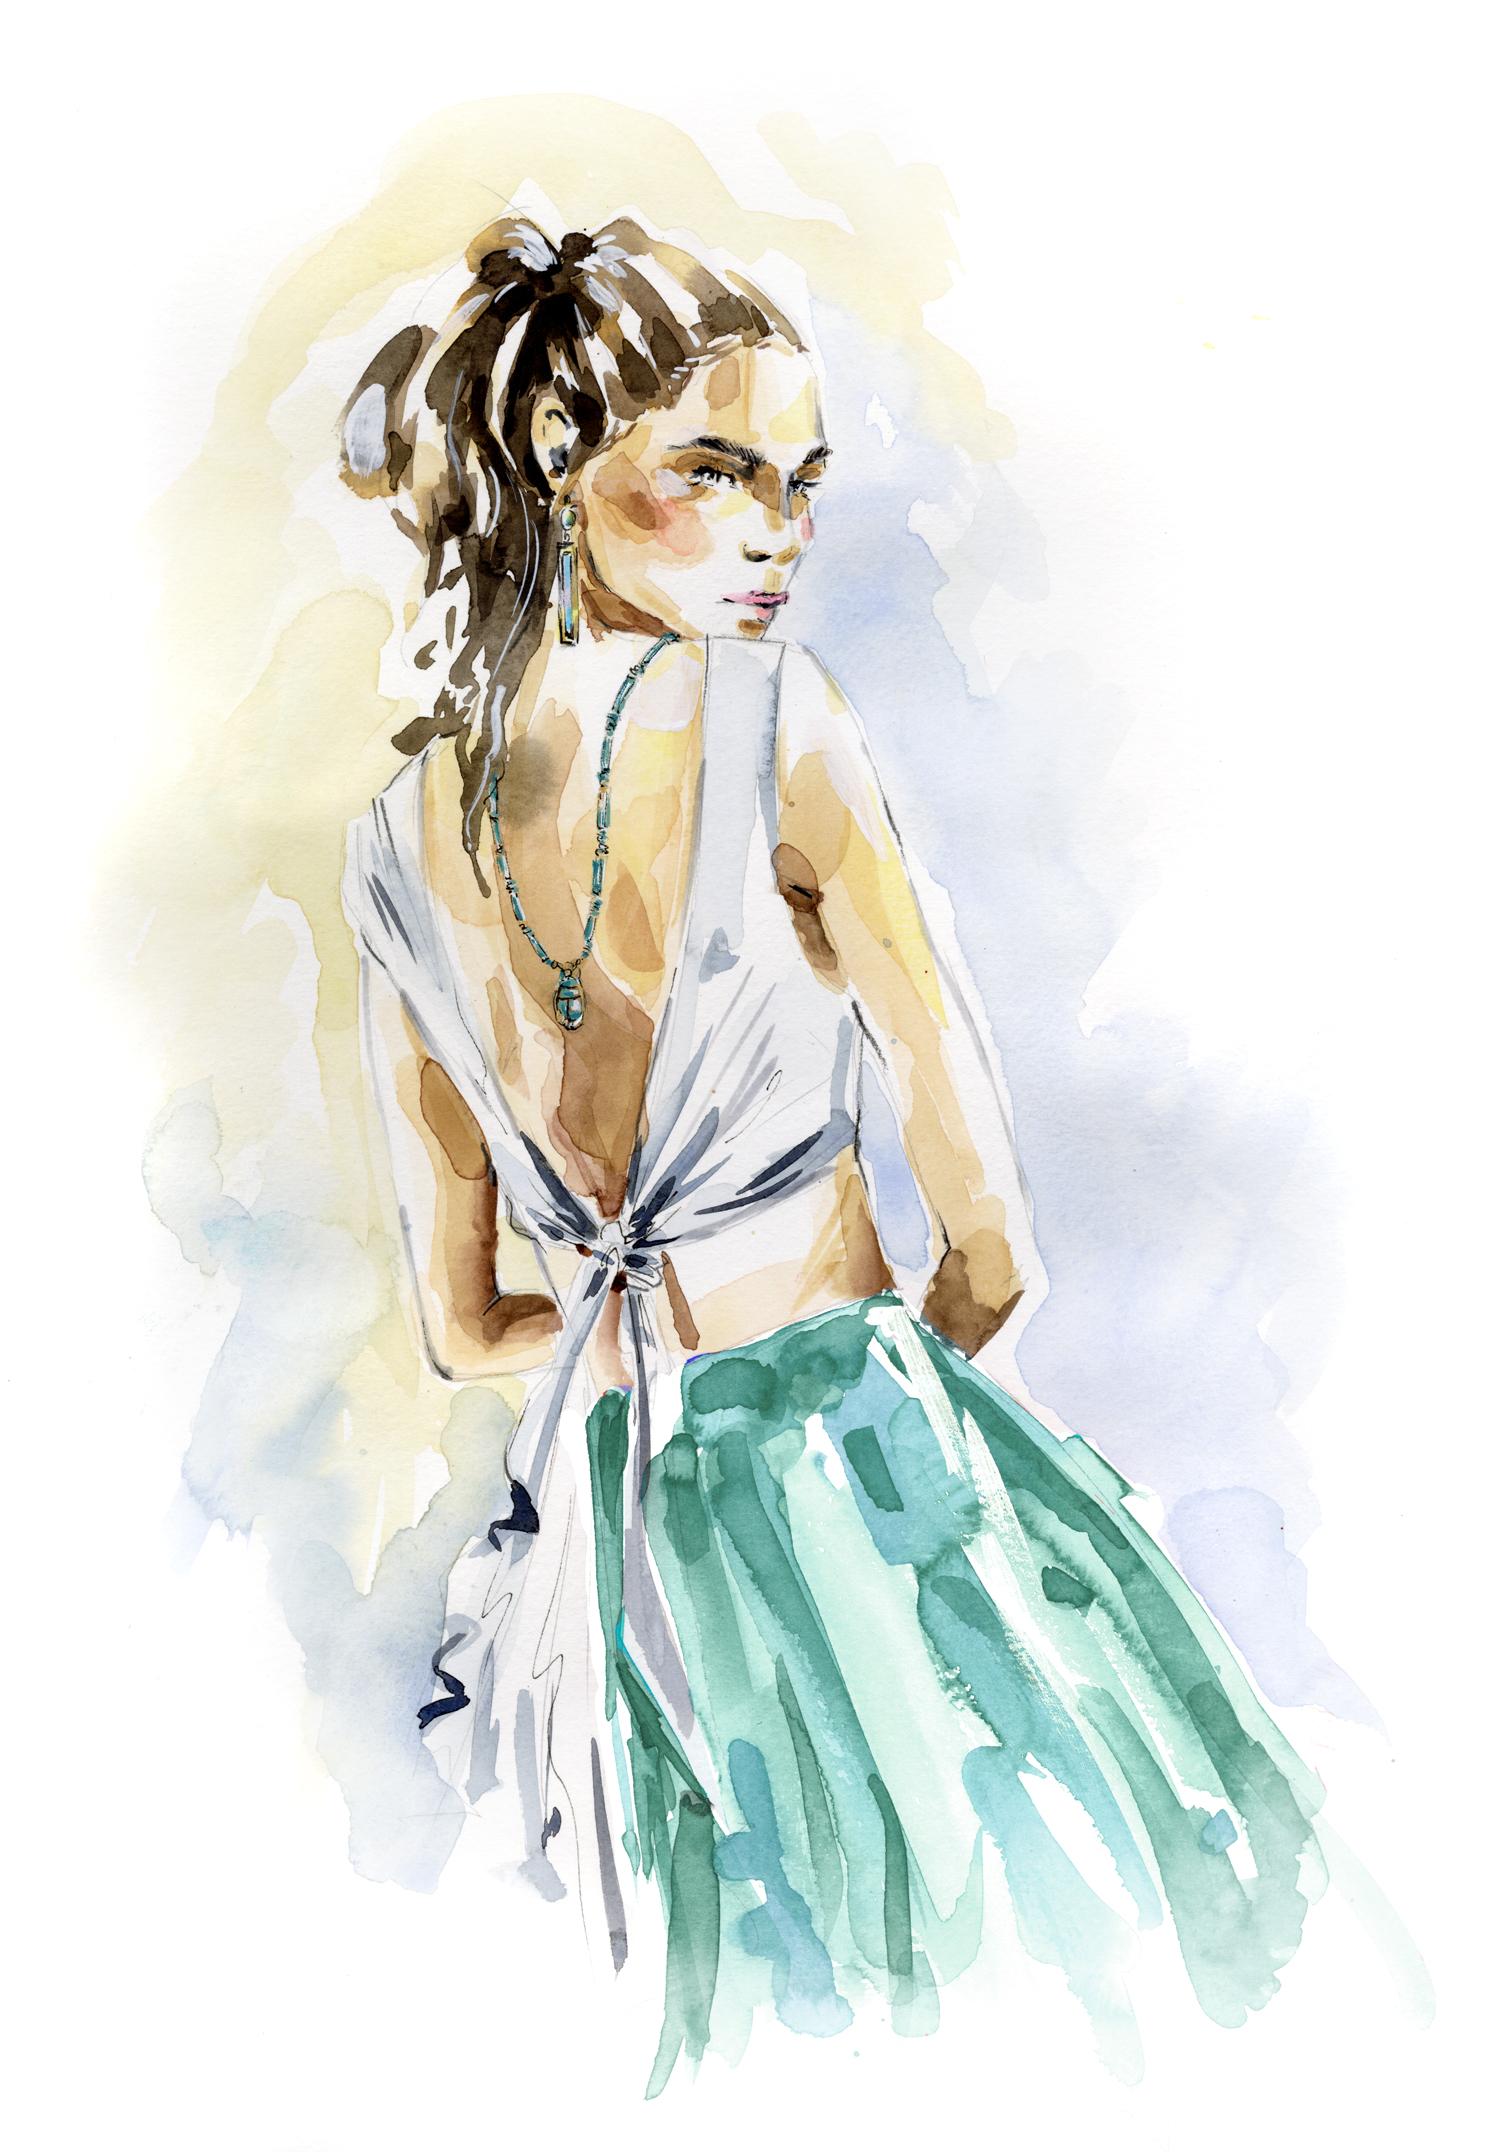 The work of artist Hillary Bott Sorrentino. Fashion. Illustration. Surface design.